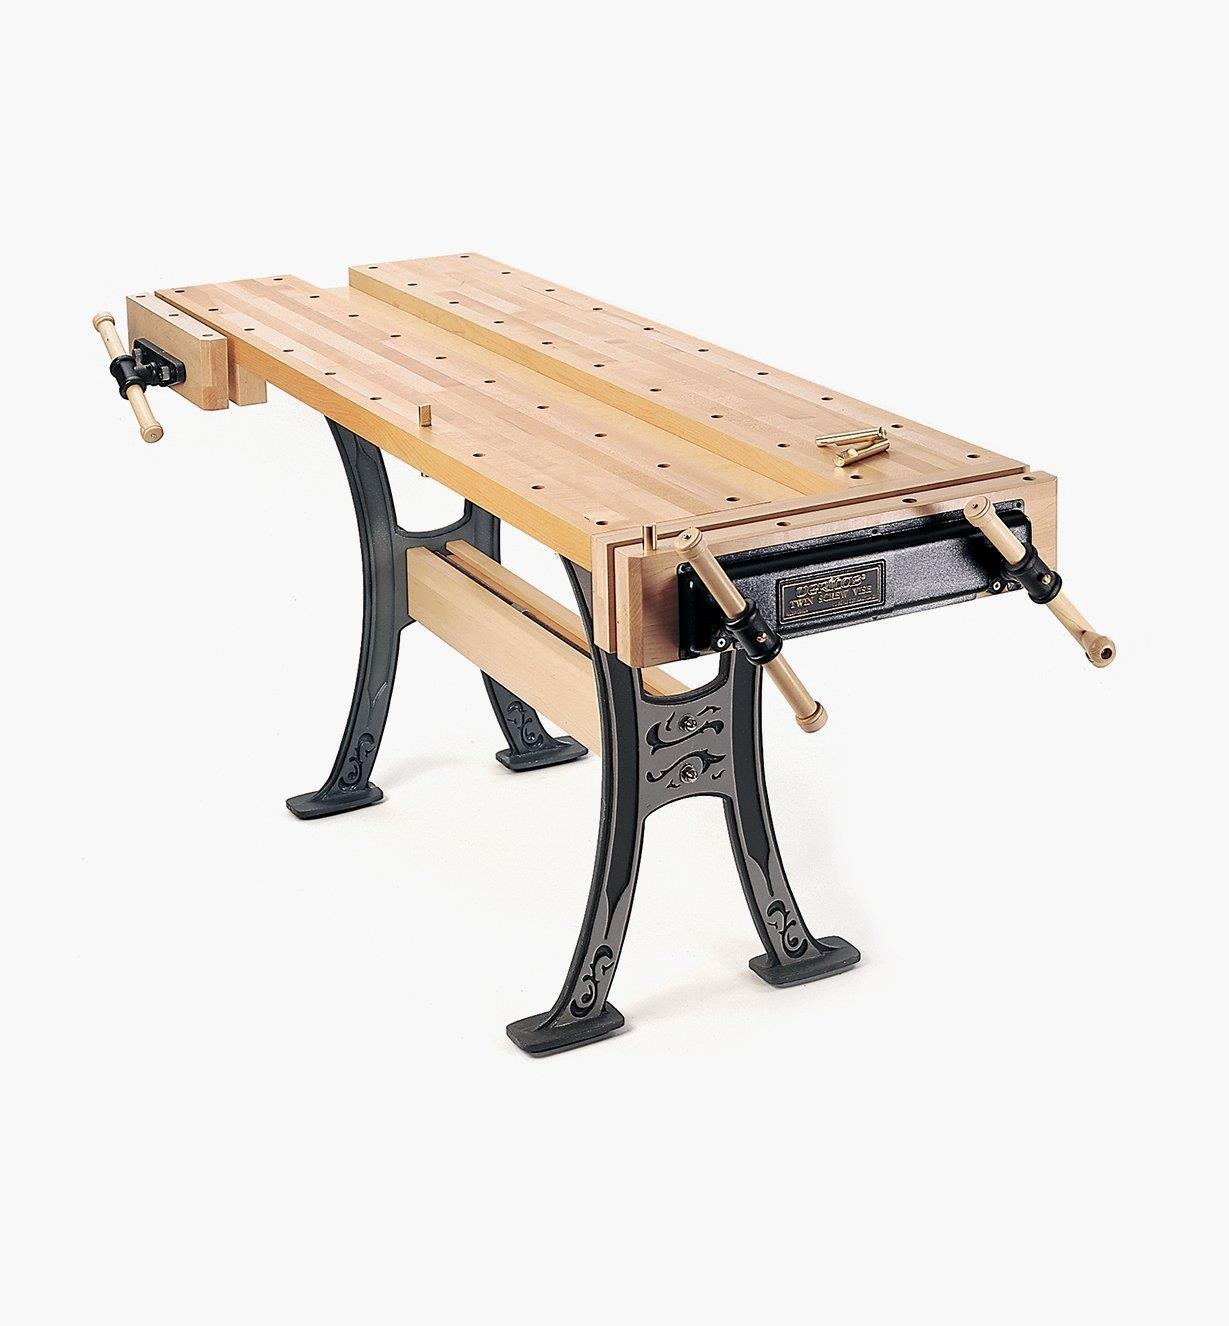 05A0201 - Veritas Bench with Cast-Iron Base